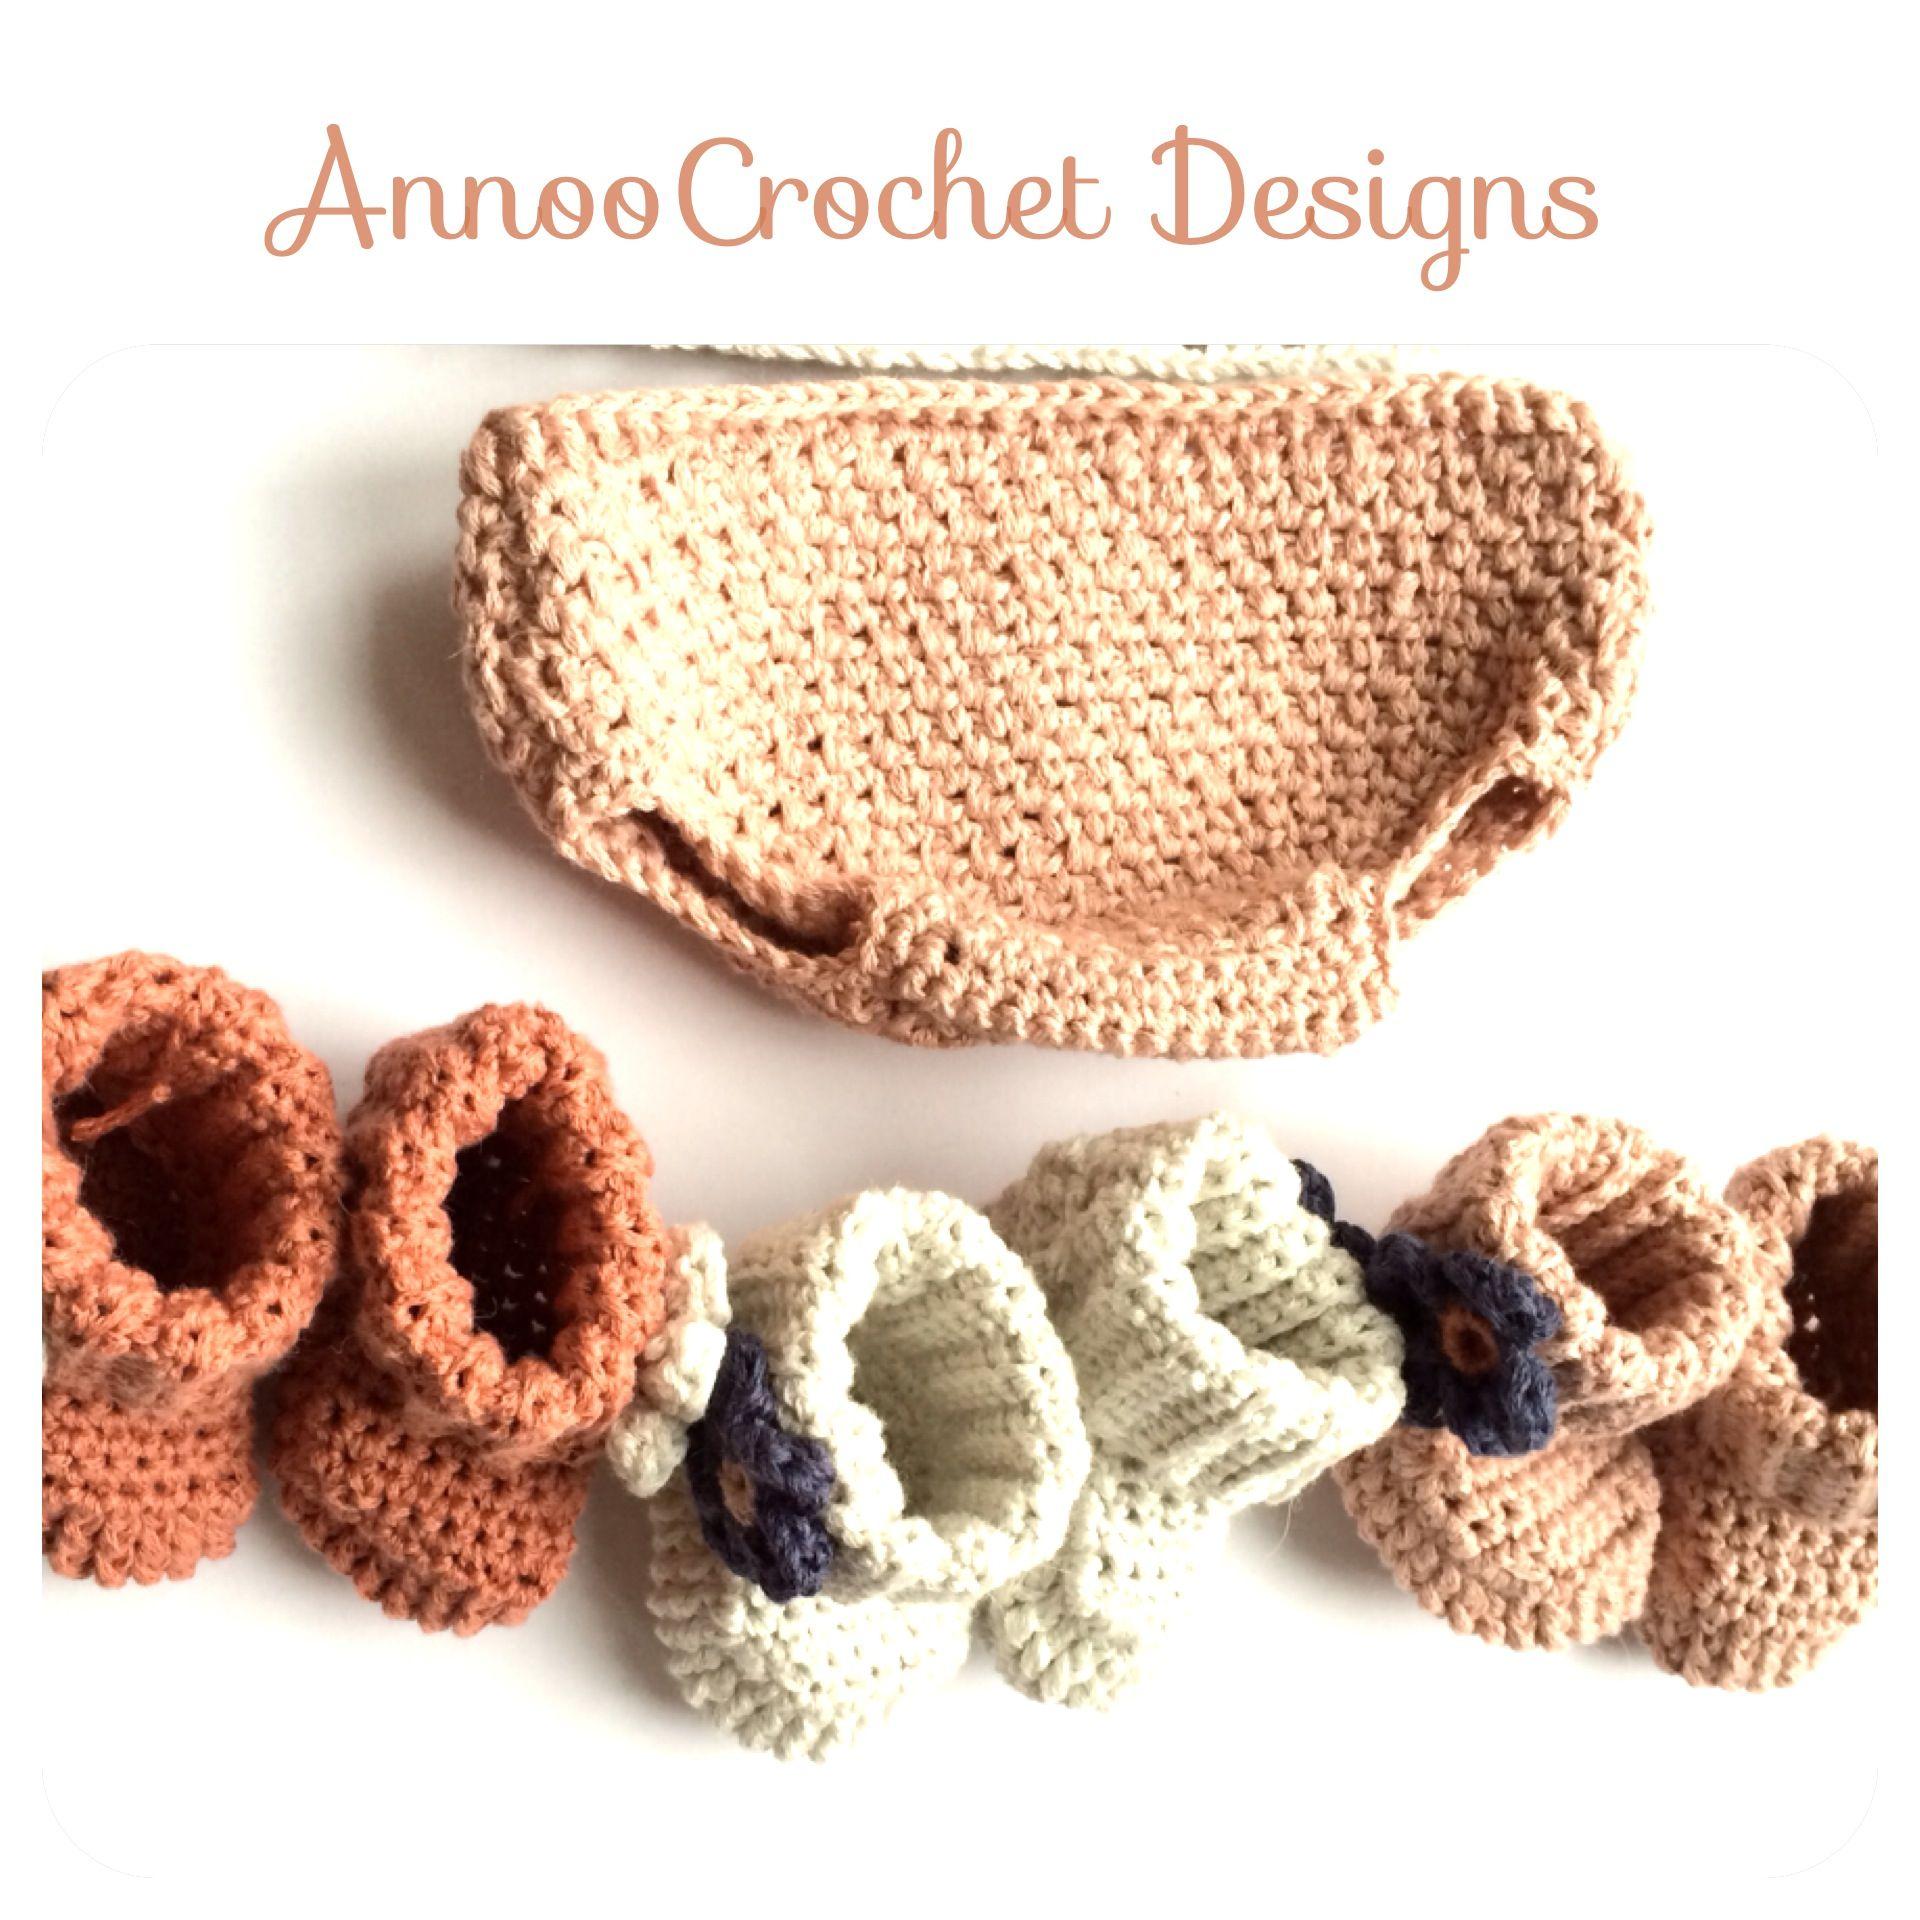 Free tutorial By AnnooCrochet Designs